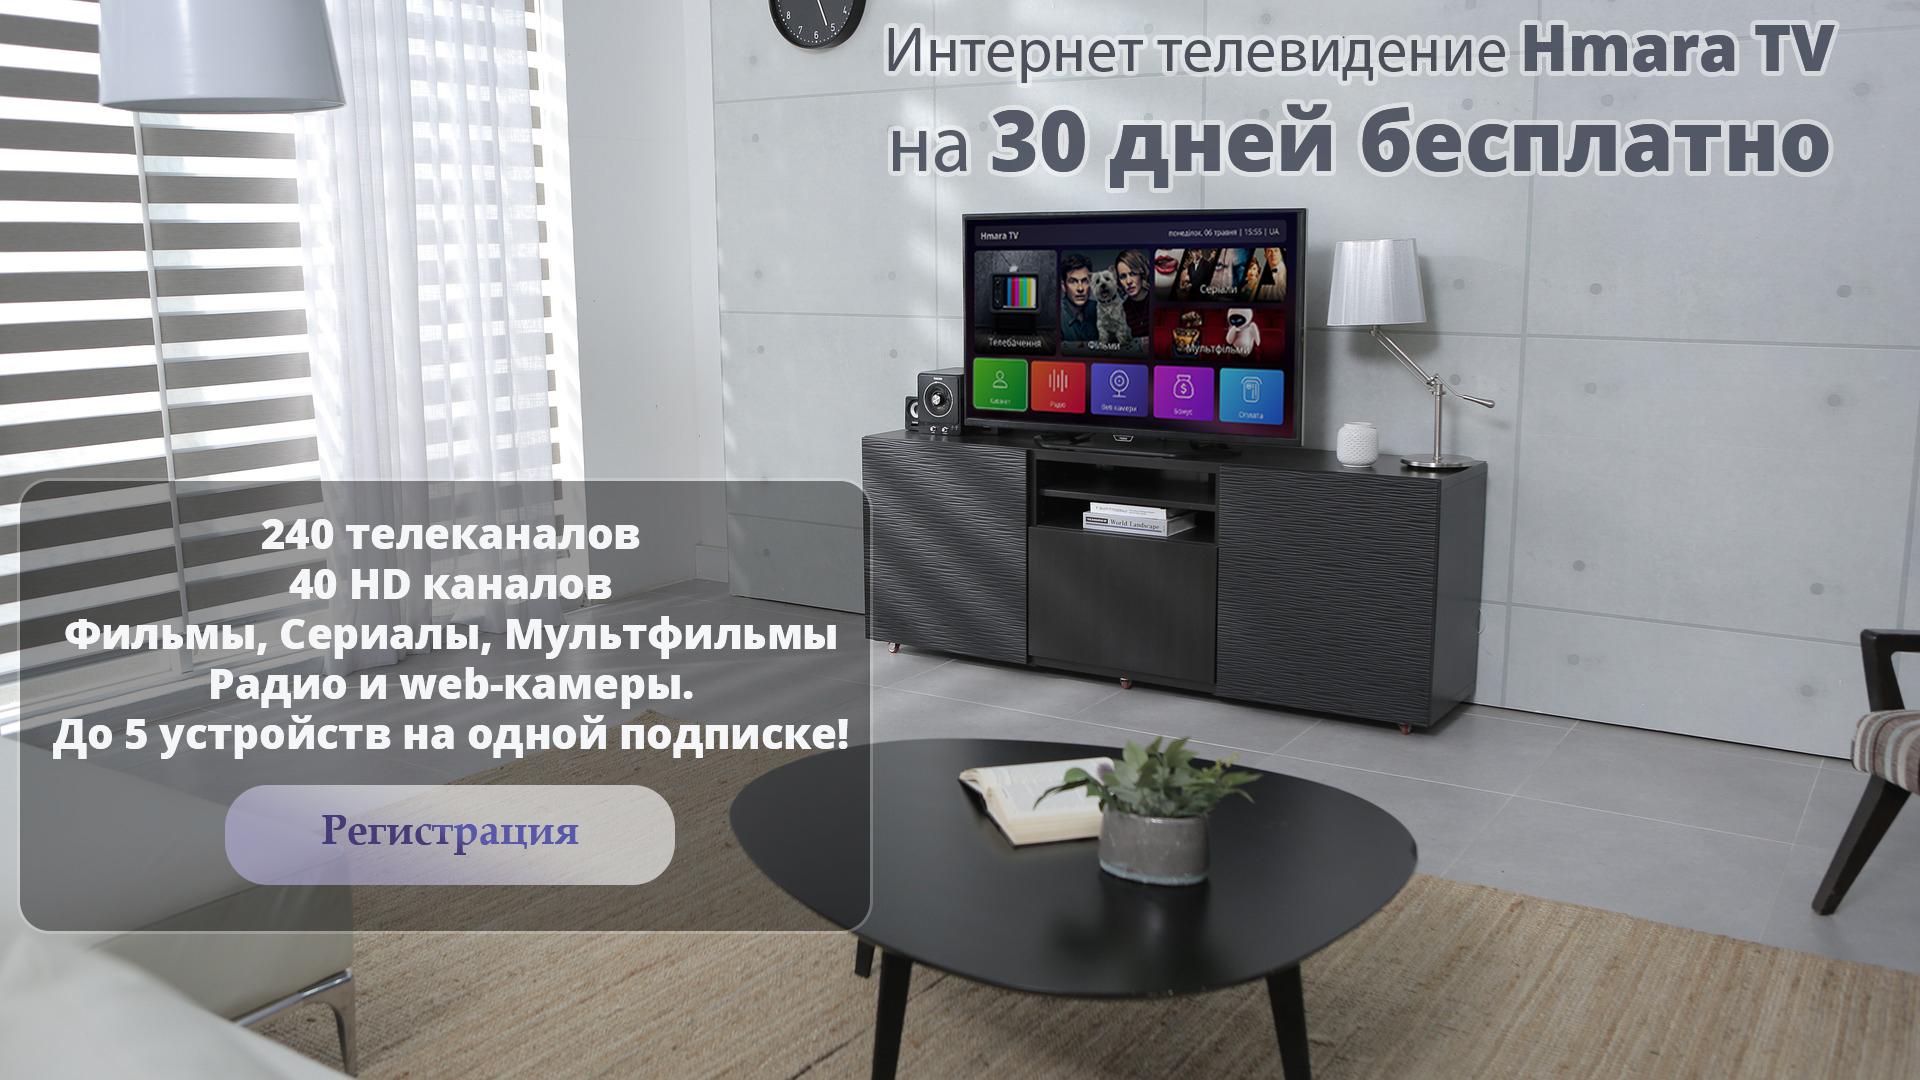 HmaraTV IPTV